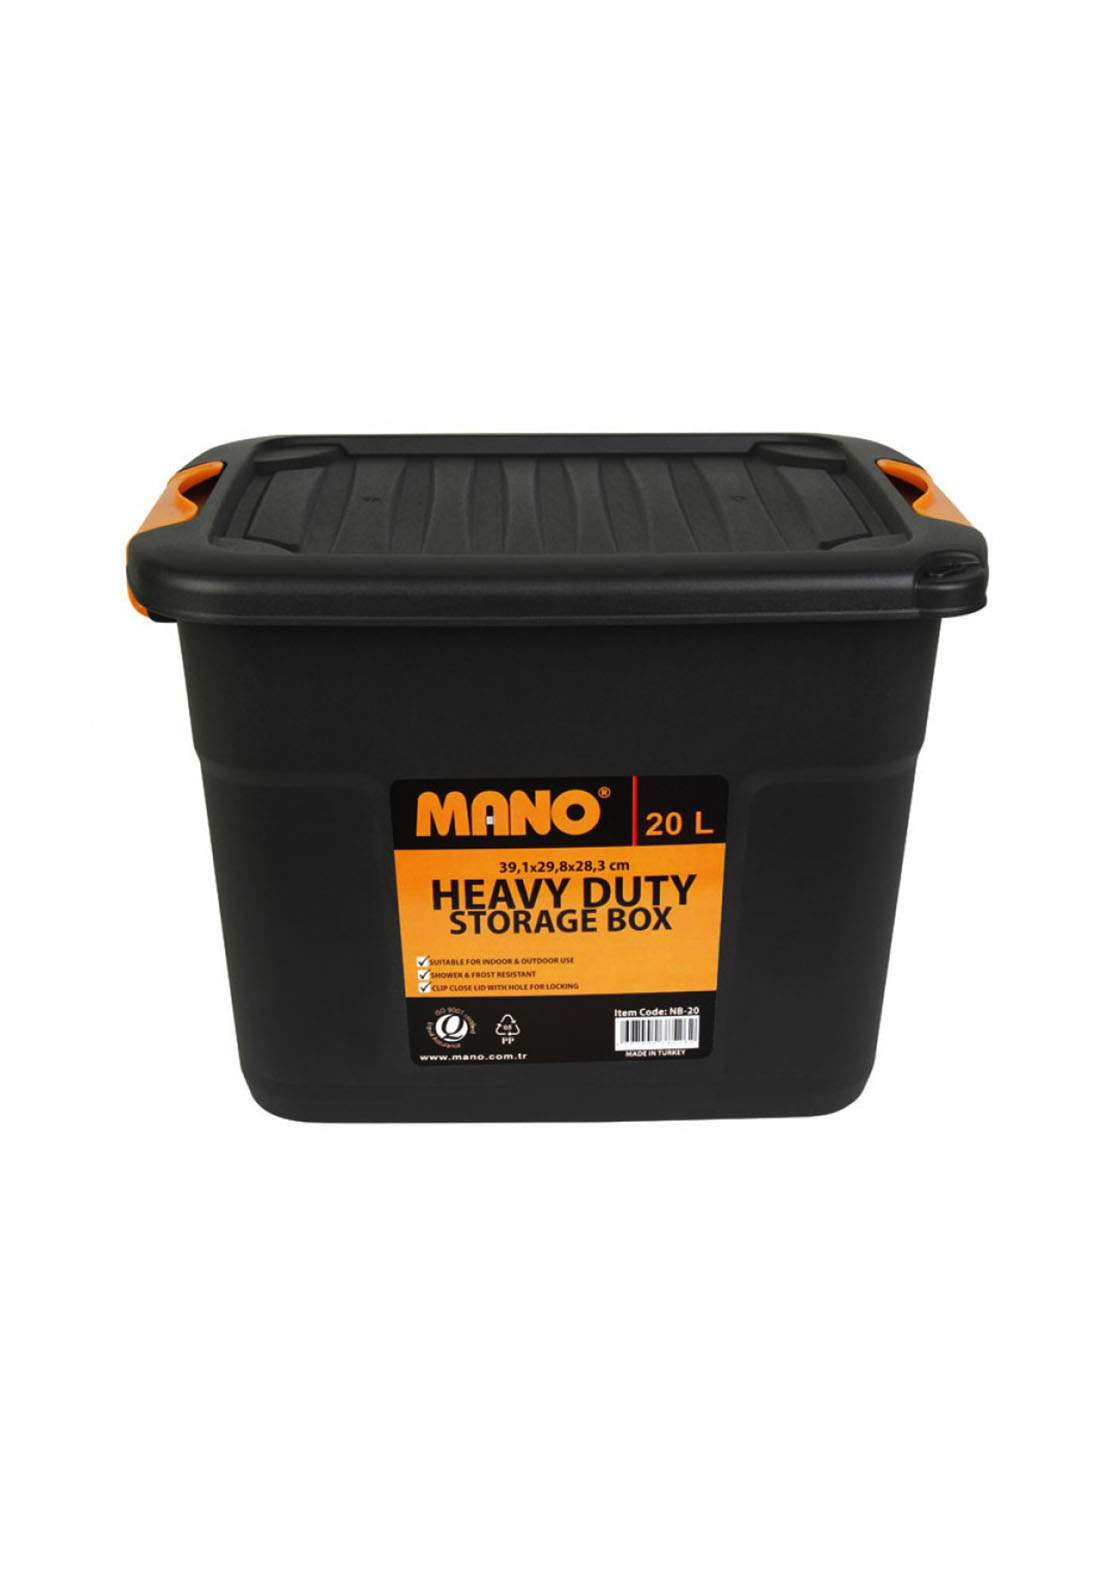 Mano NB-20 Storage Box 20L صندوق تخزين